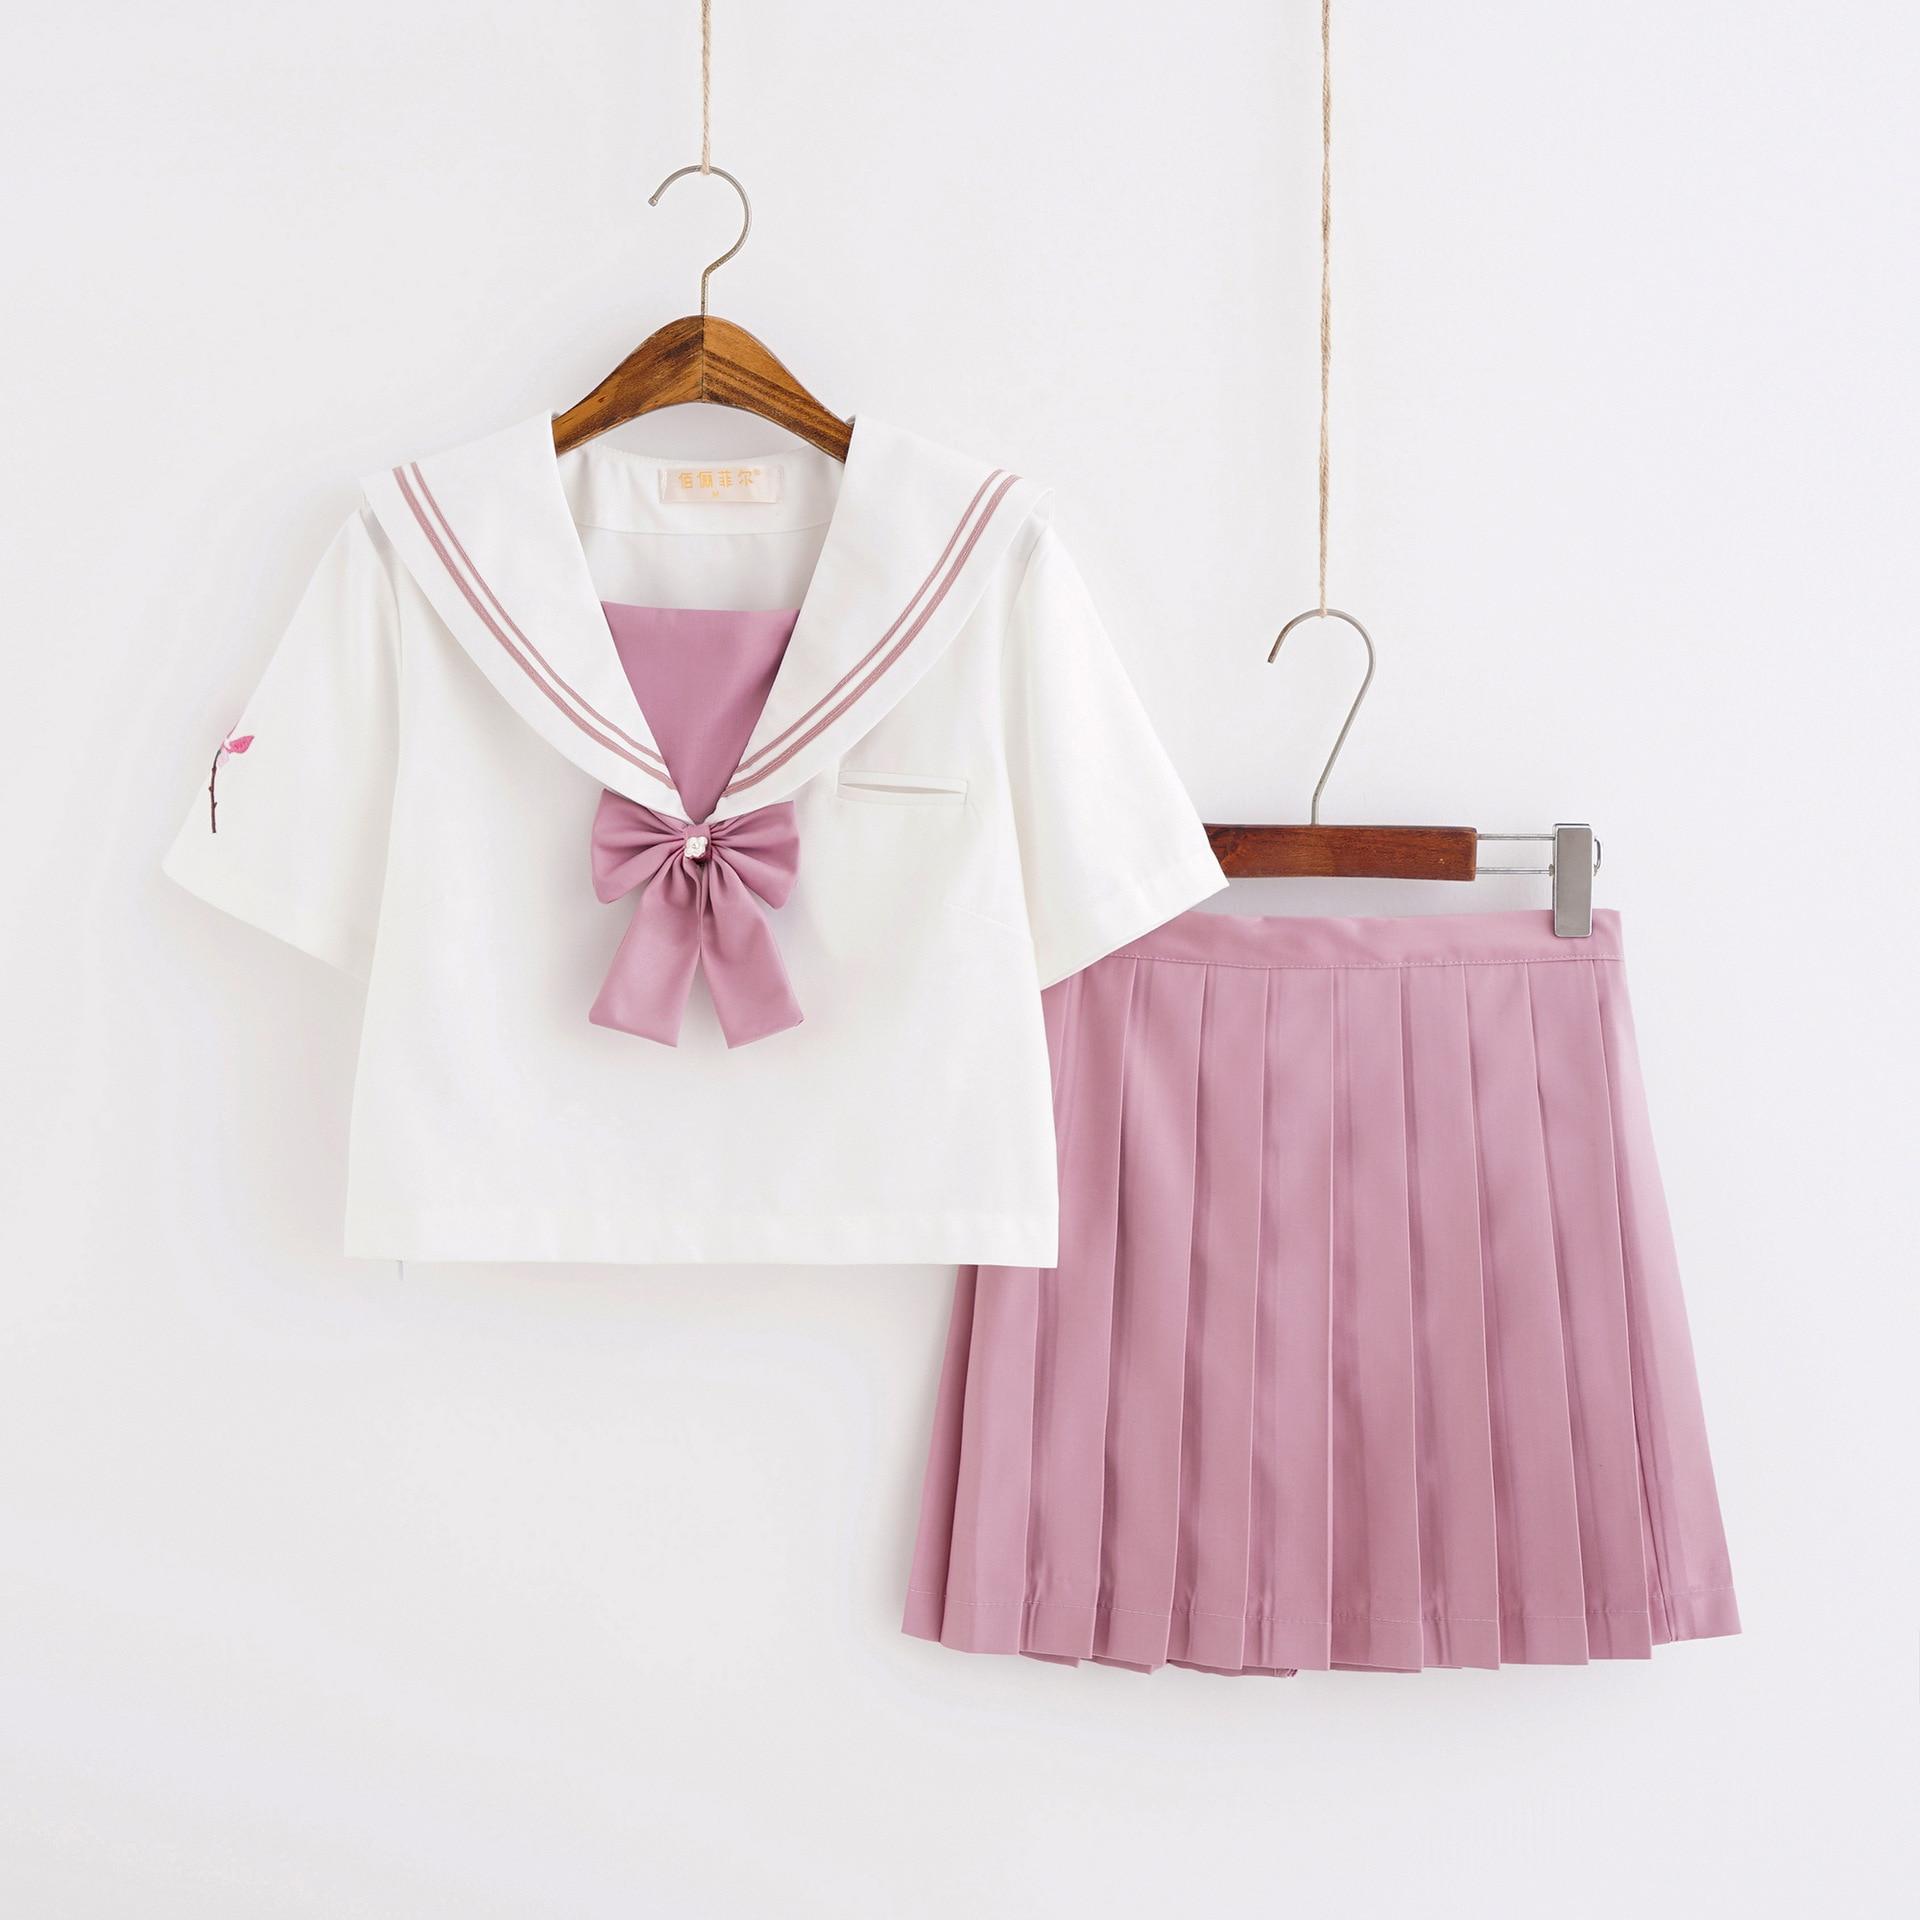 Japanese Girl JK Uniform Sailor Style Suit Student White Blouse School Uniform Short Sleeve Suit Women Pink Pleated Skirt Summer